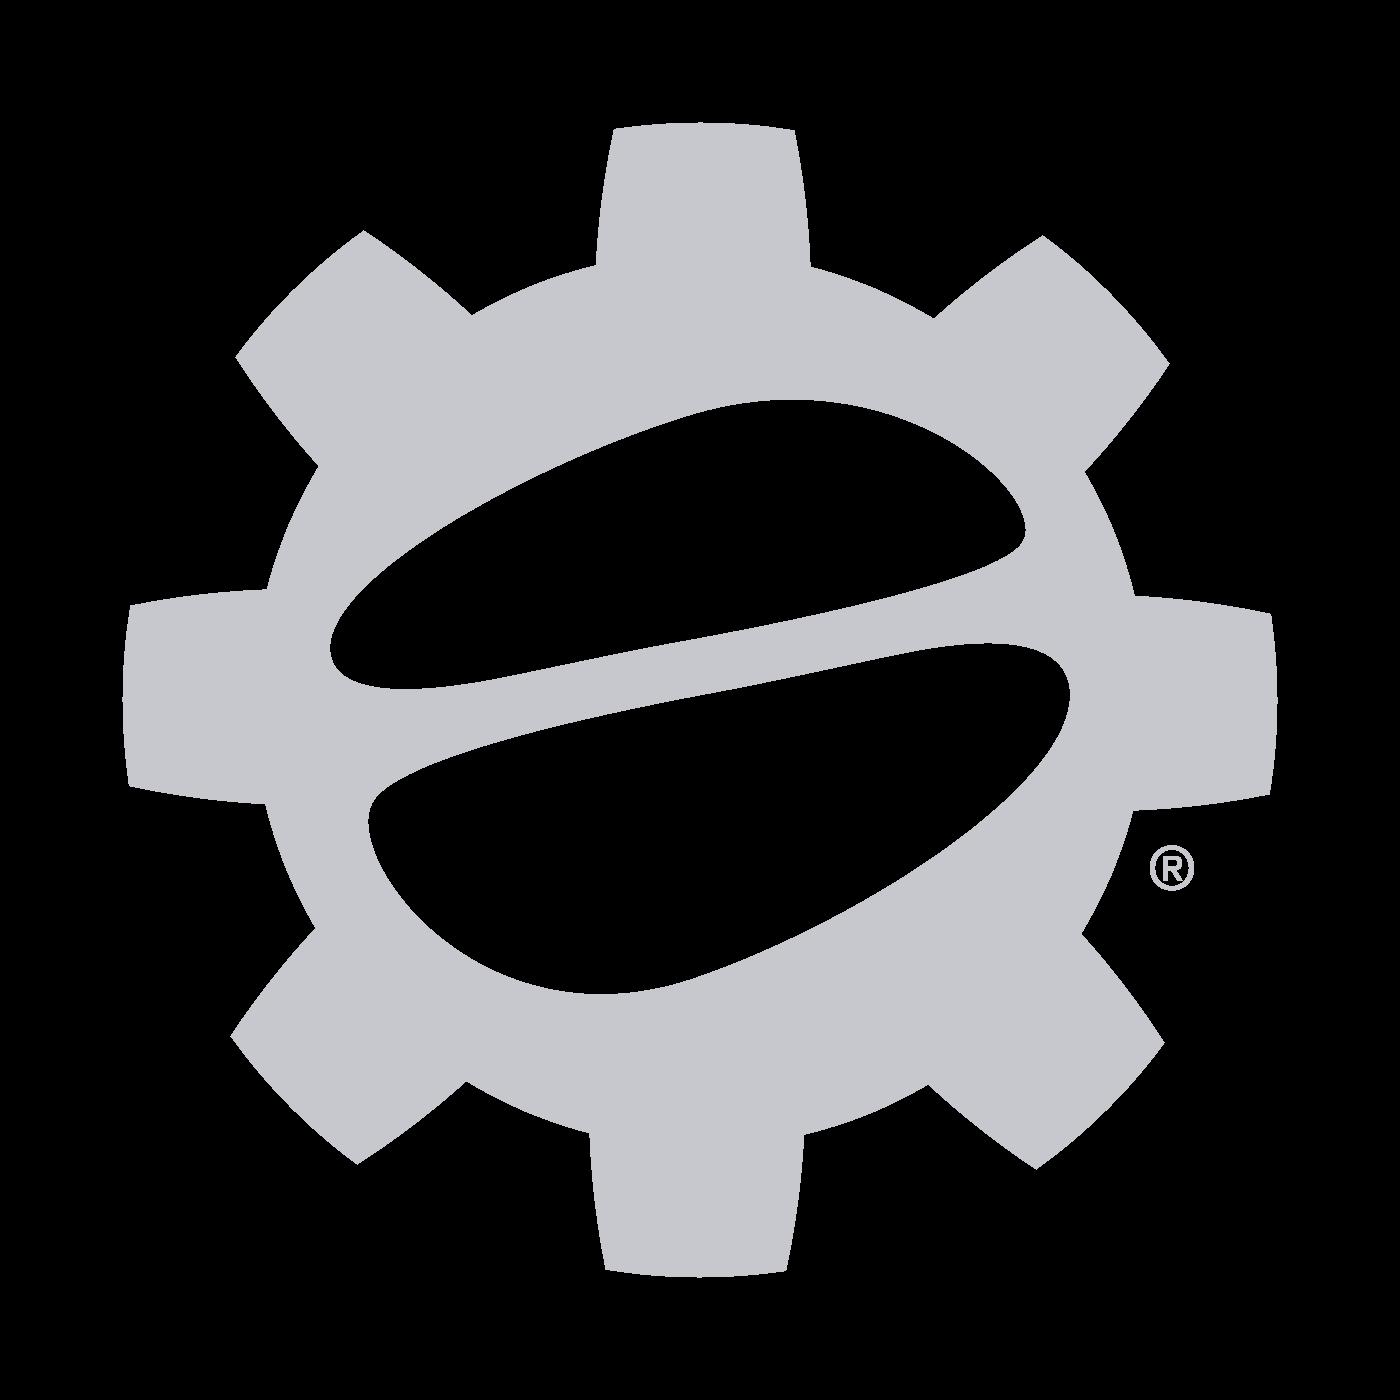 49th Parallel Coffee - Longitude 123 W